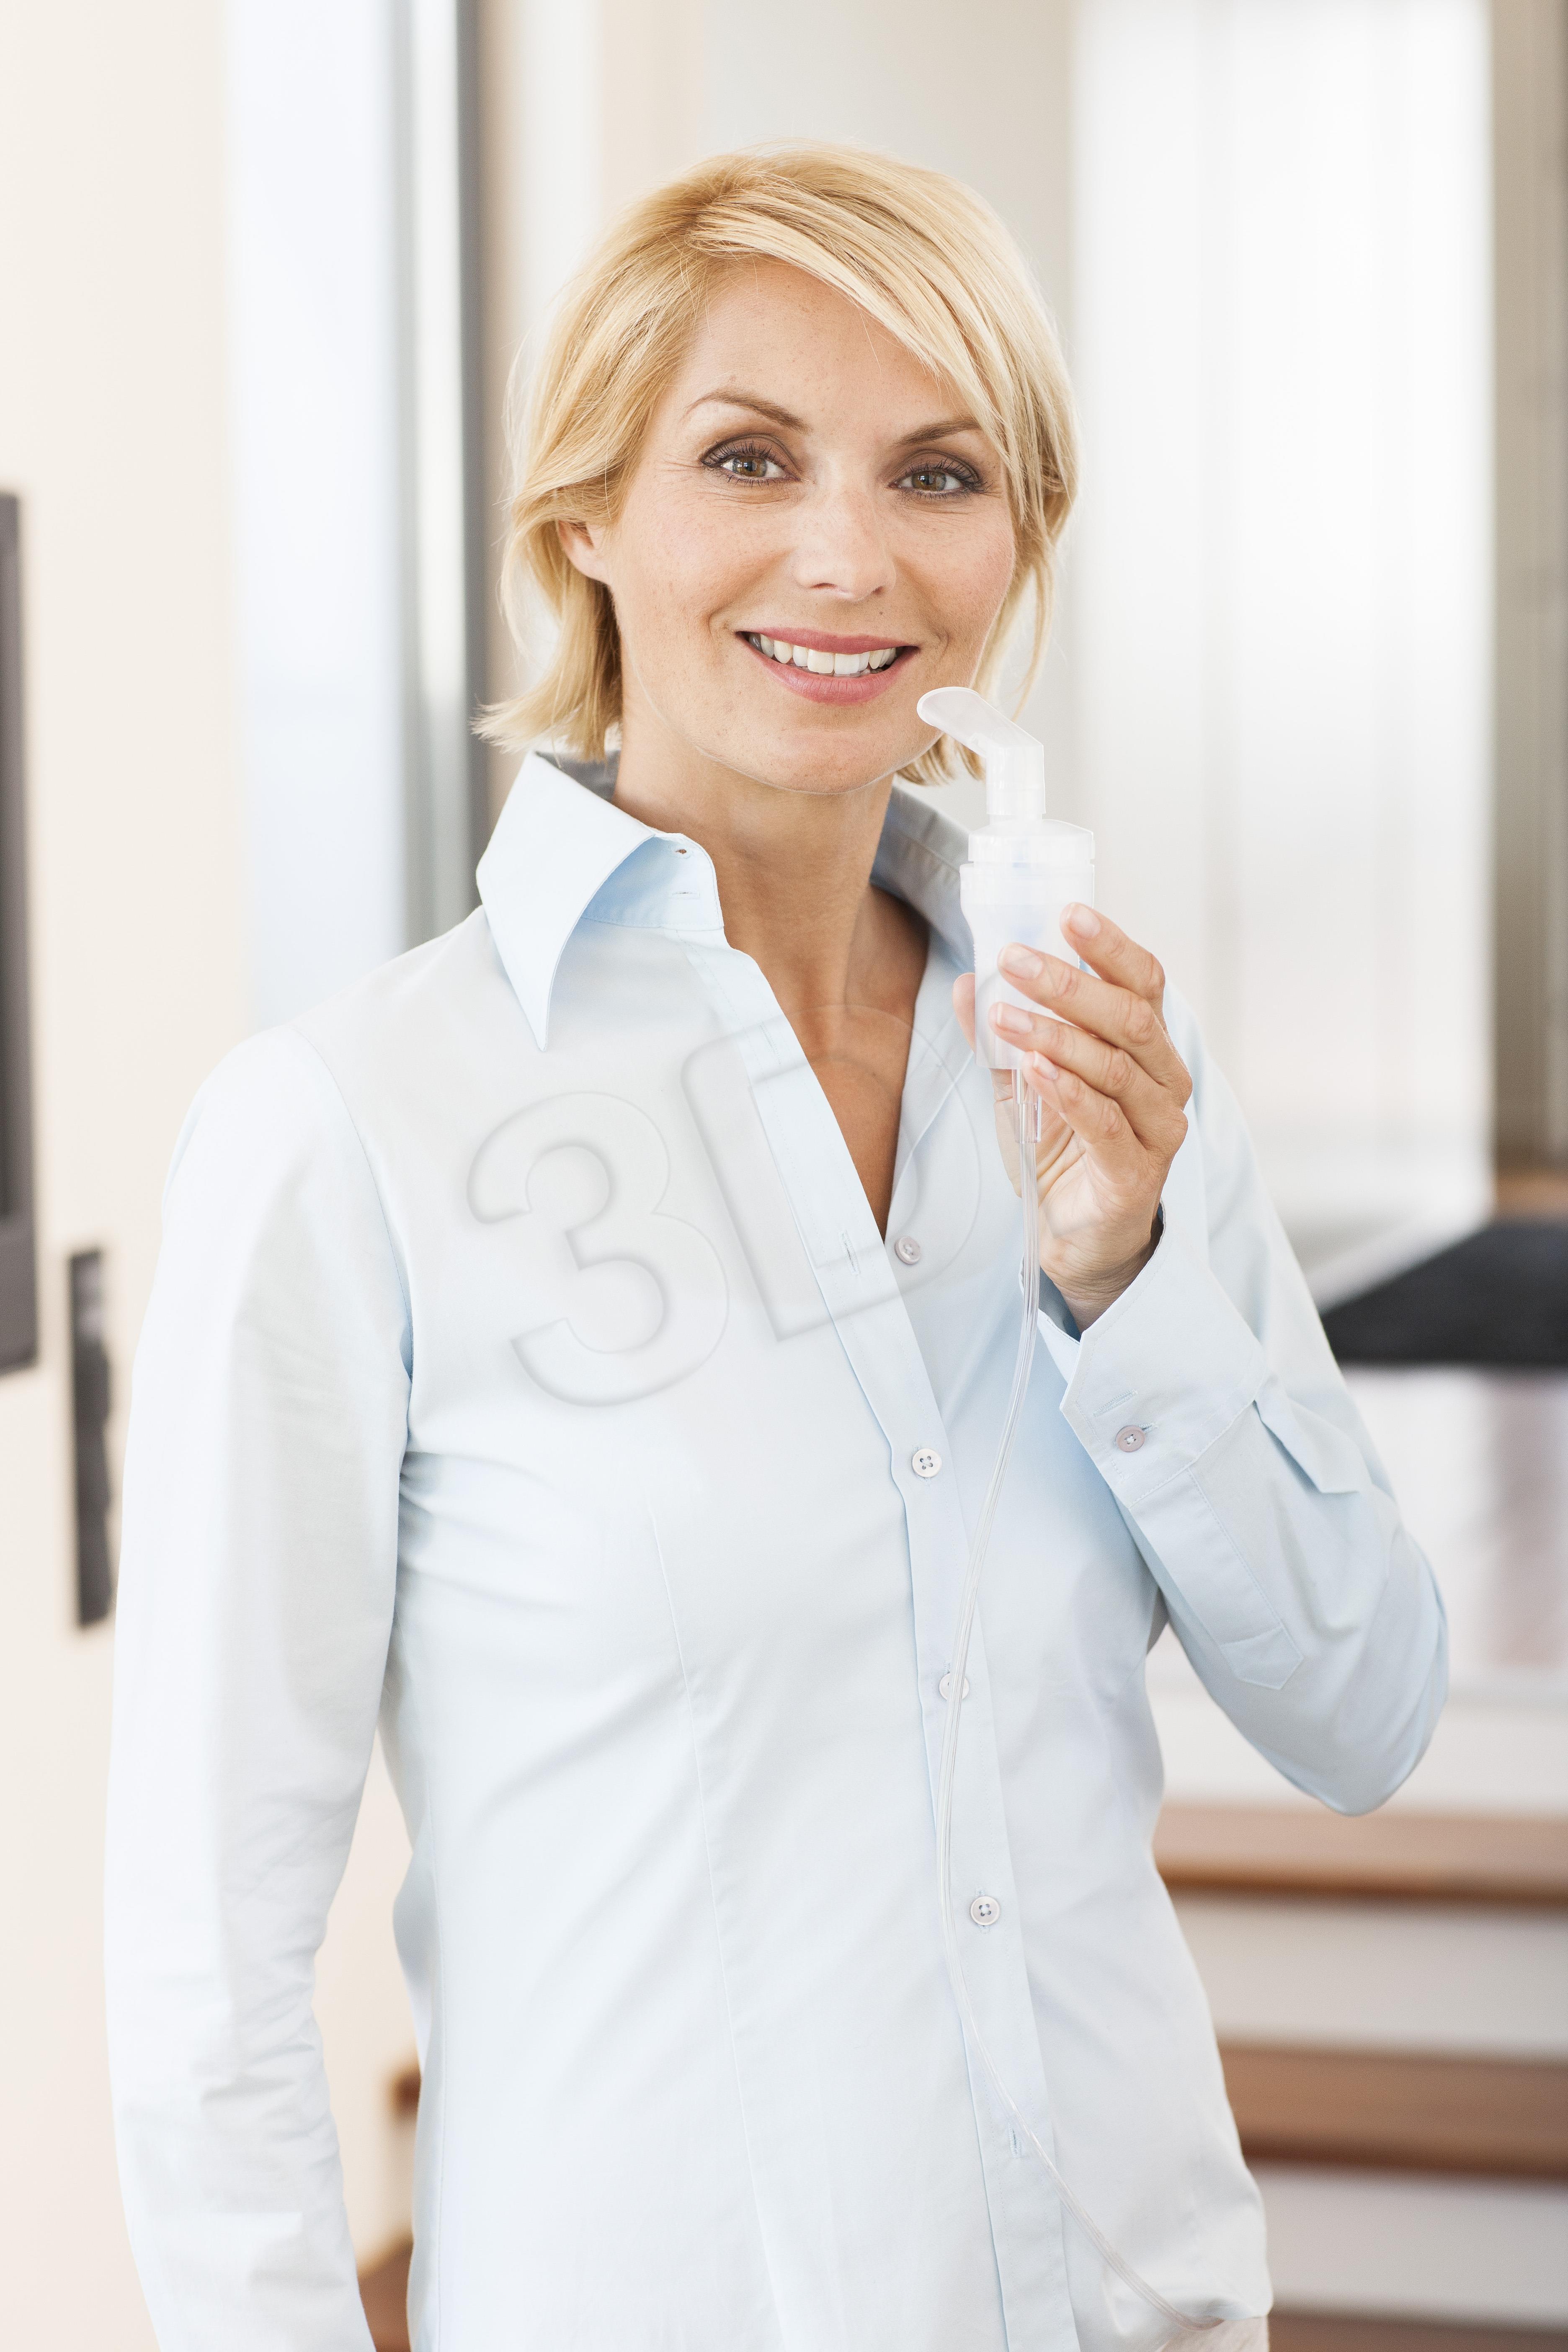 Inhaler compressor Medisana 54520 (white color) inhalators